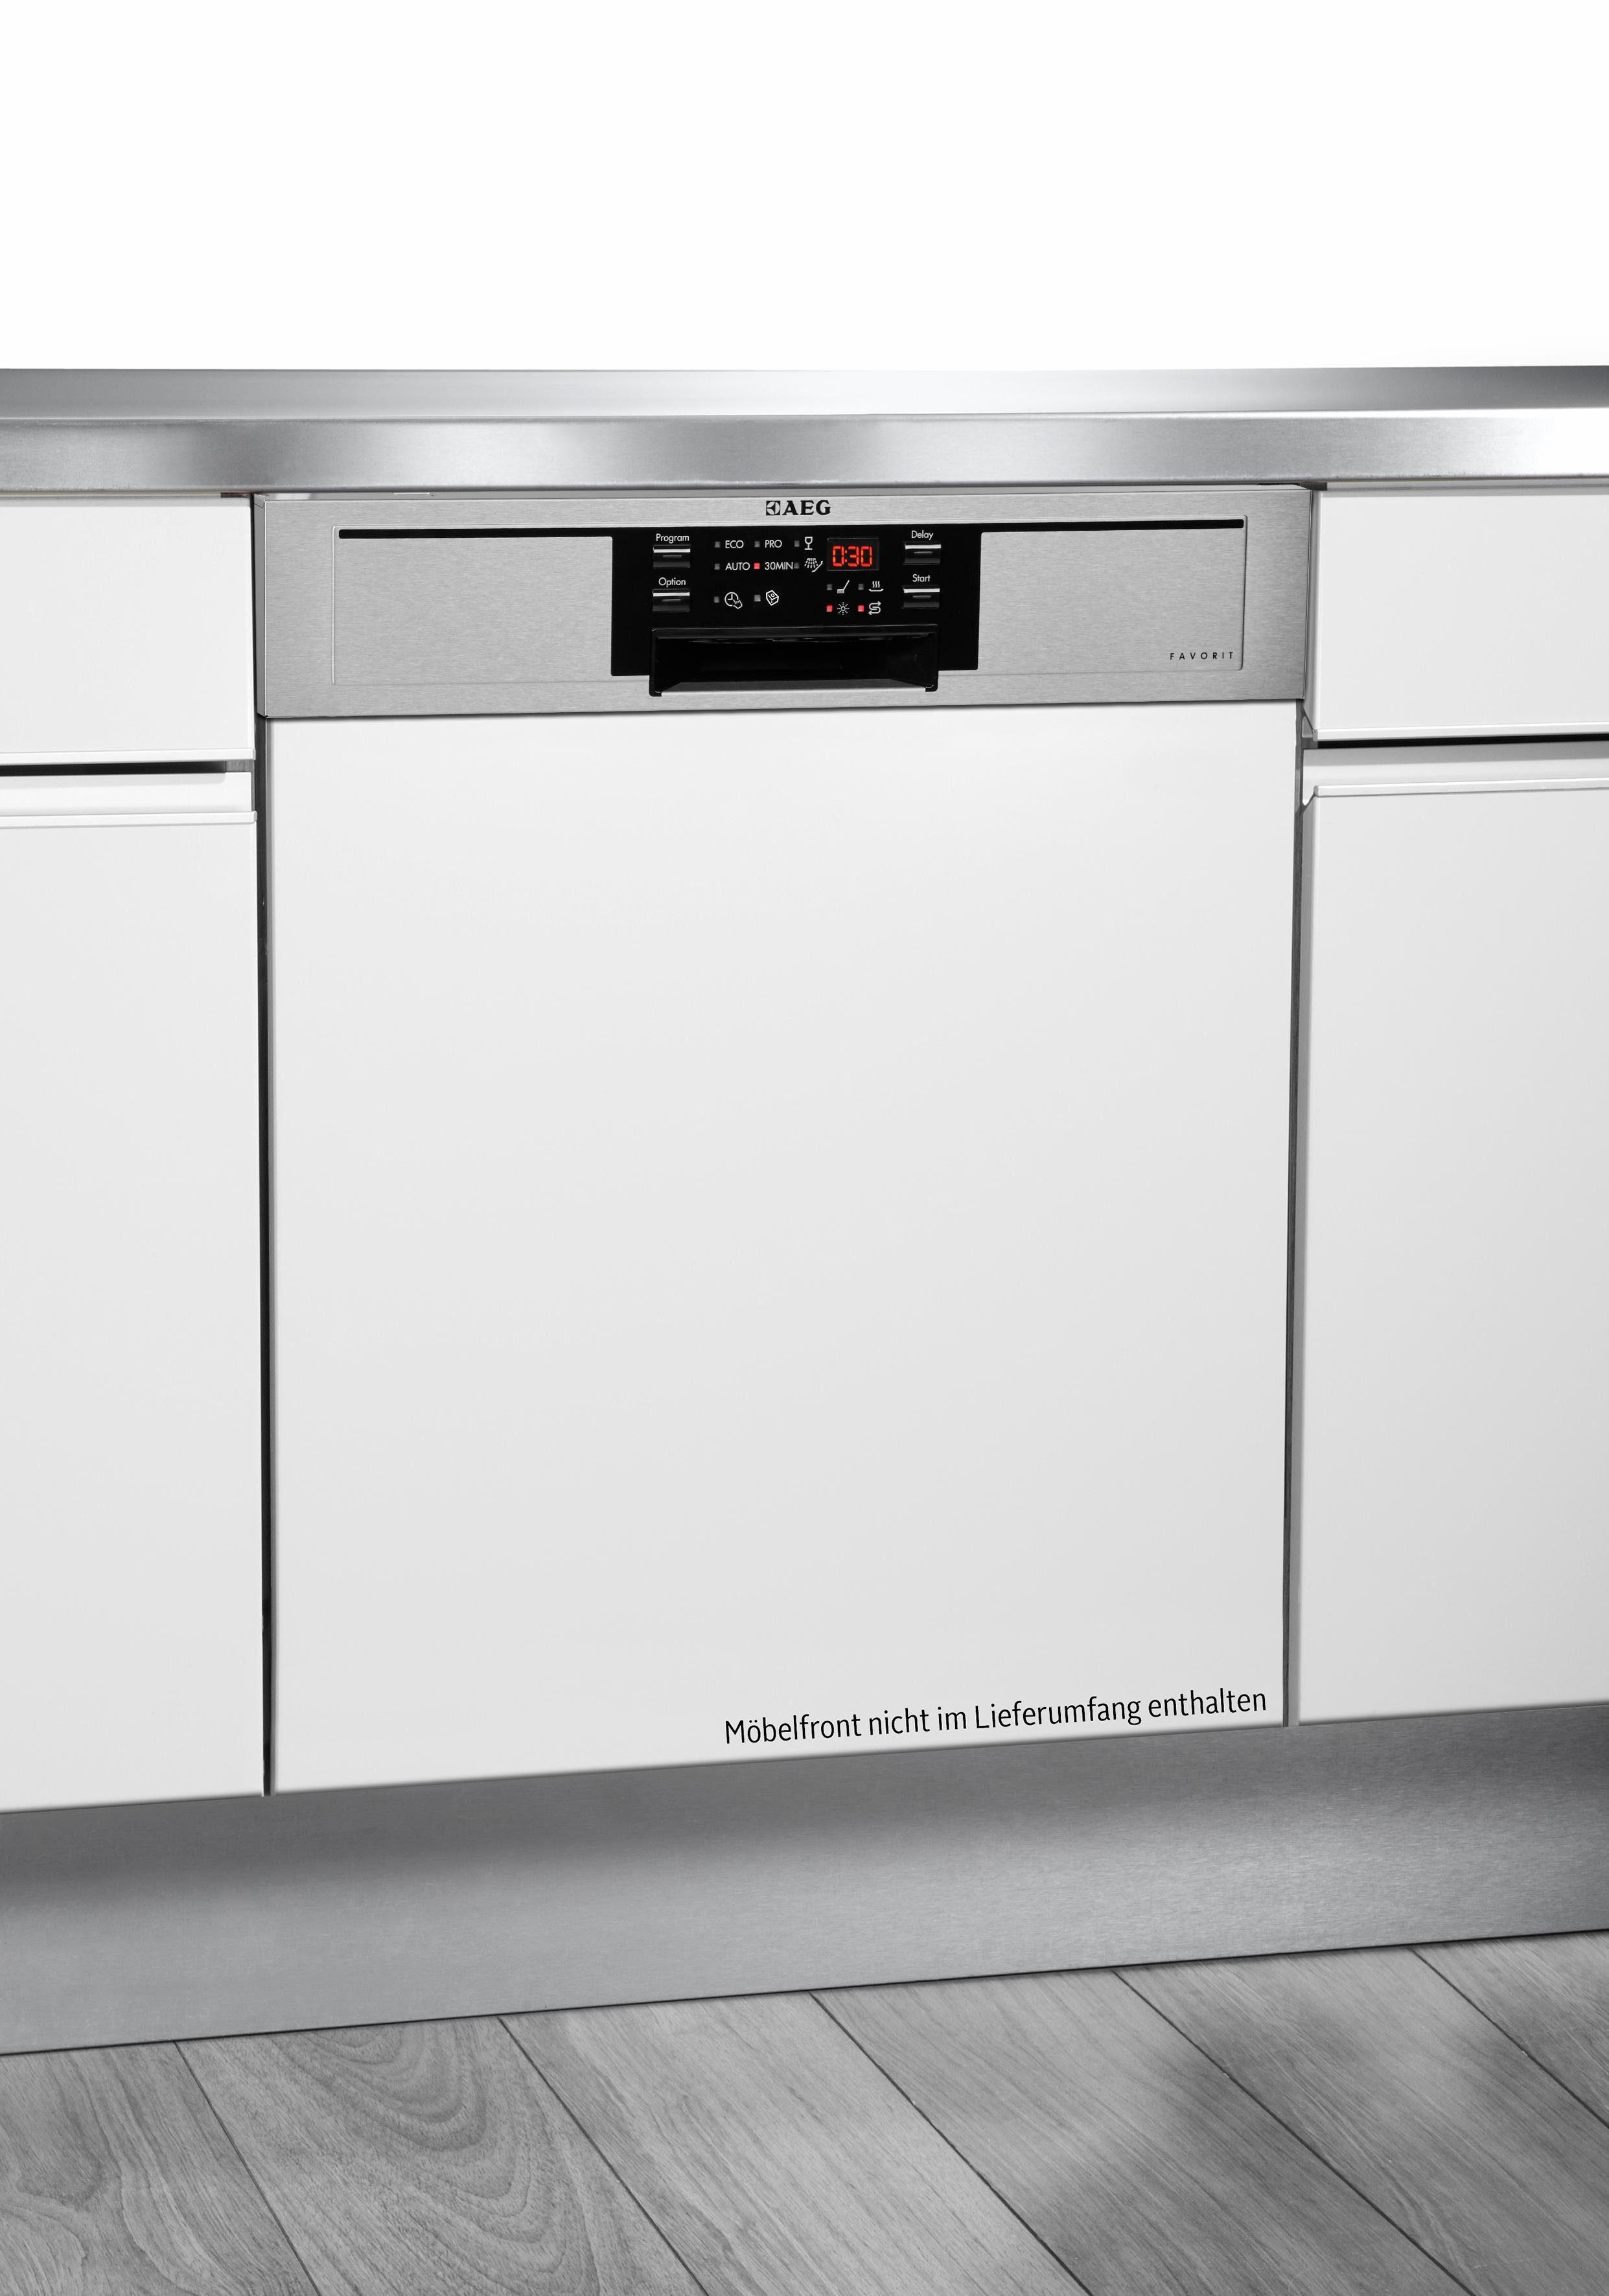 AEG Teilintegrierbarer Geschirrspüler Favorit F26302IM0, A++, 9,9 Liter, 13 Maßgedecke